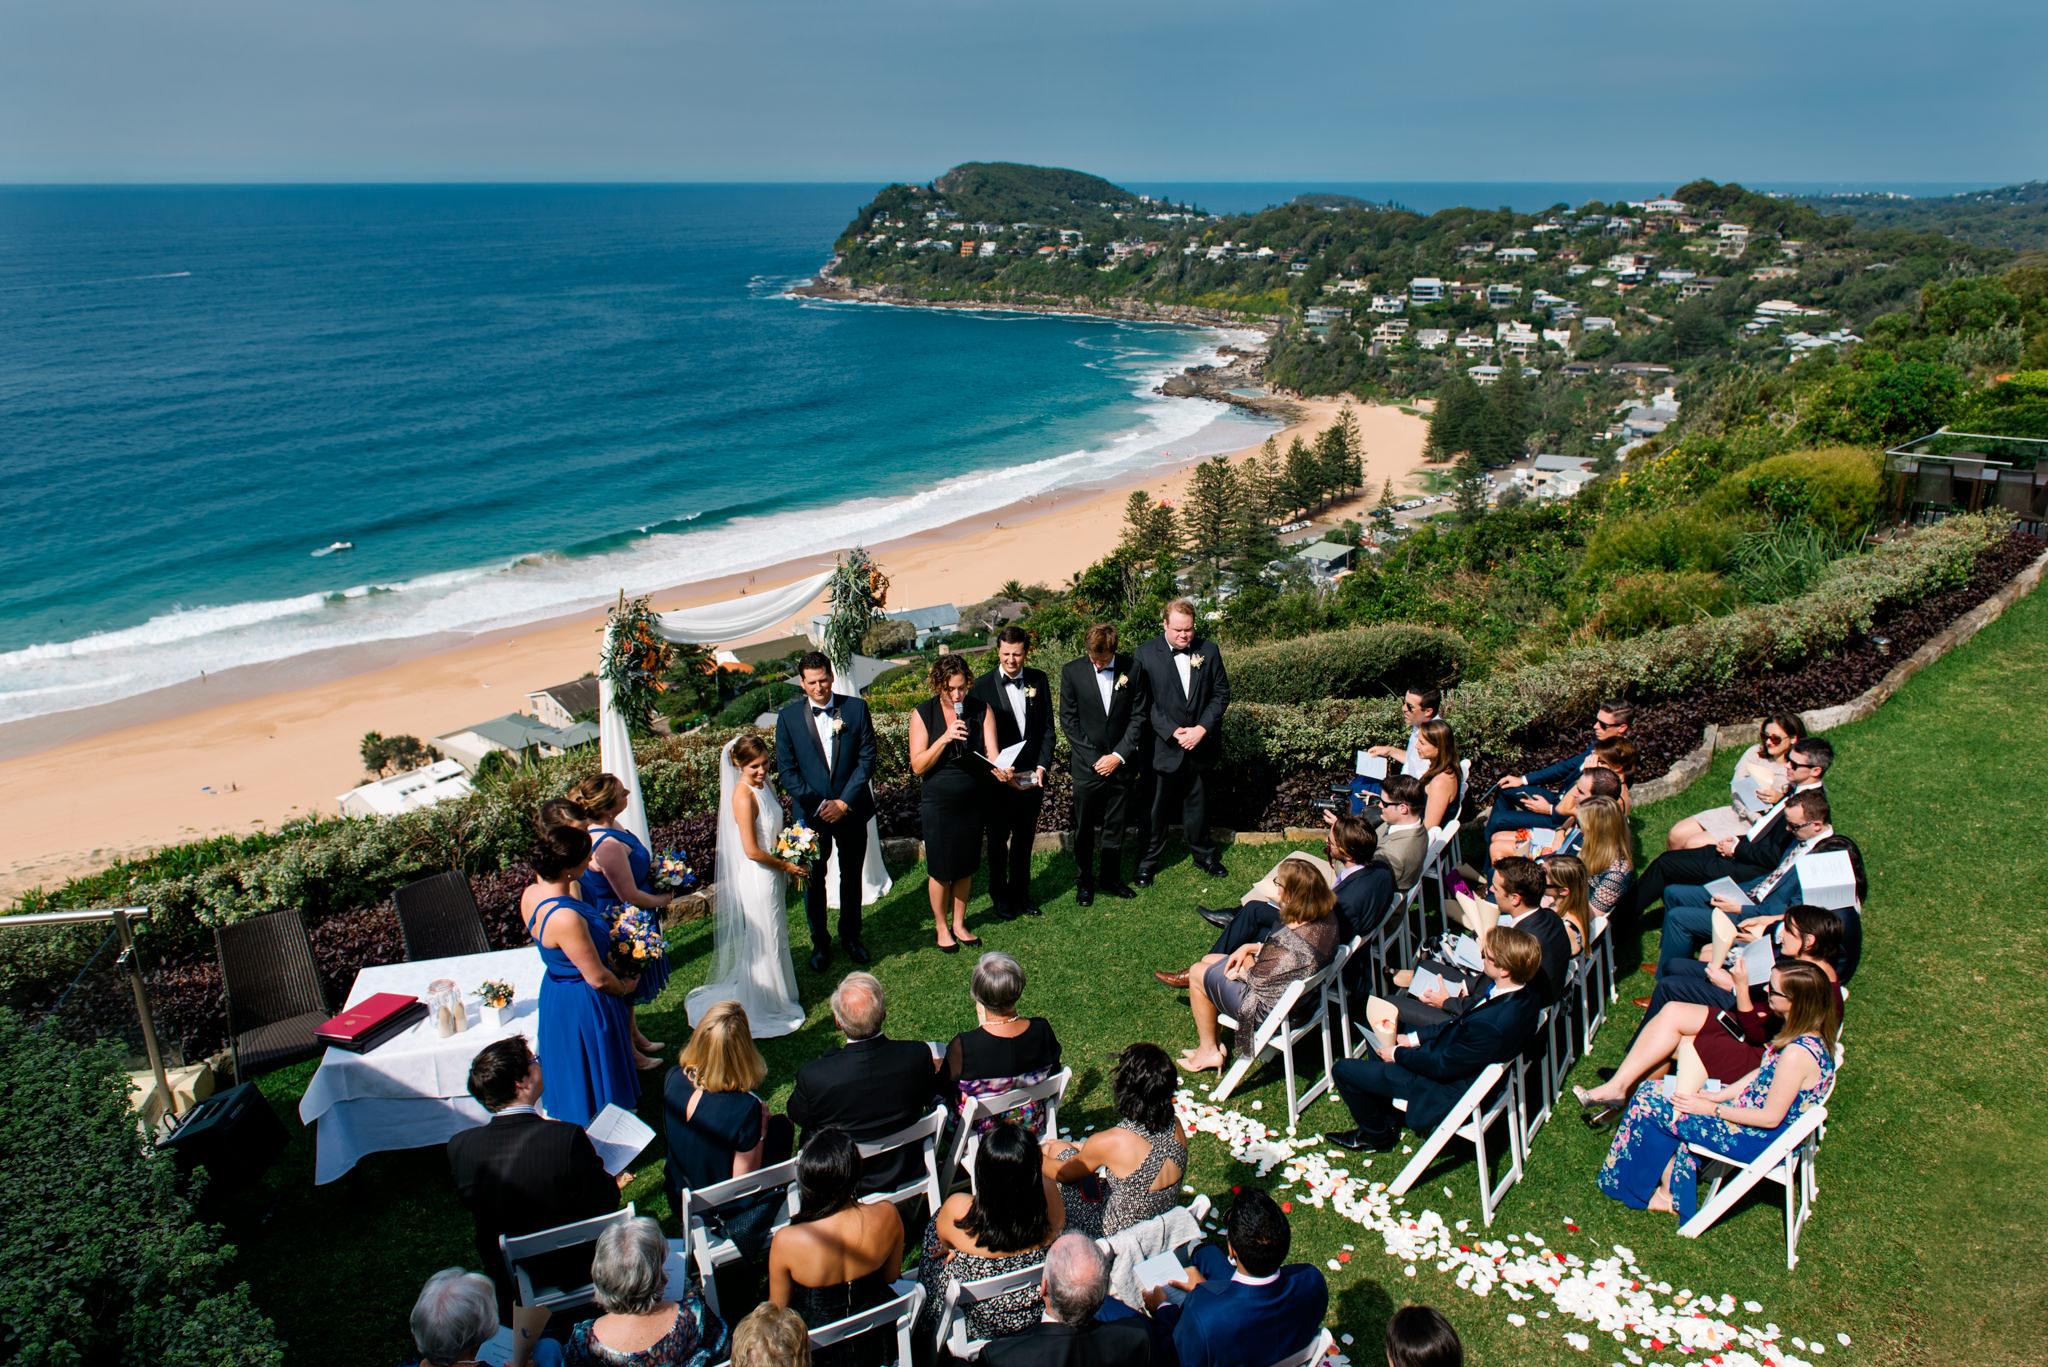 Jonahs-Whale-Beach-wedding-0001.jpg